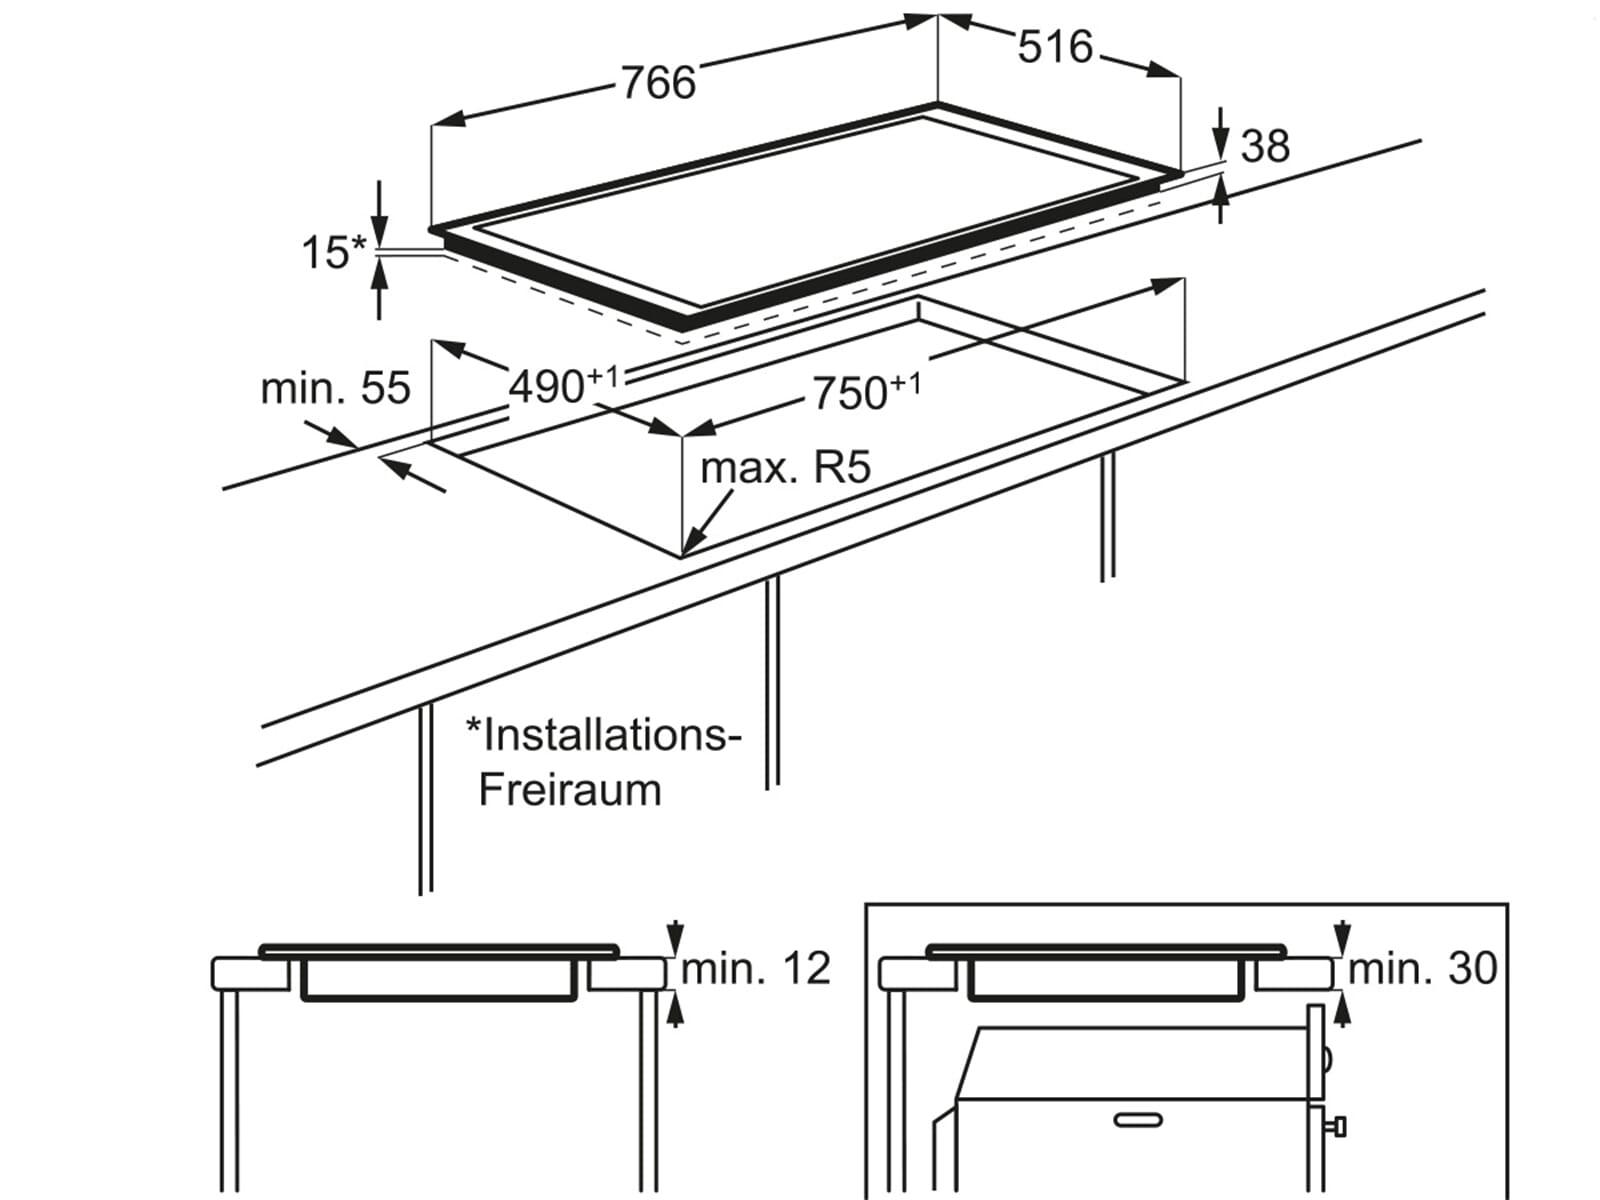 aeg bp31083 set pyrolyse backofen bp3003001m glaskeramik kochfeld hk854080x b f r 998 90 eur. Black Bedroom Furniture Sets. Home Design Ideas